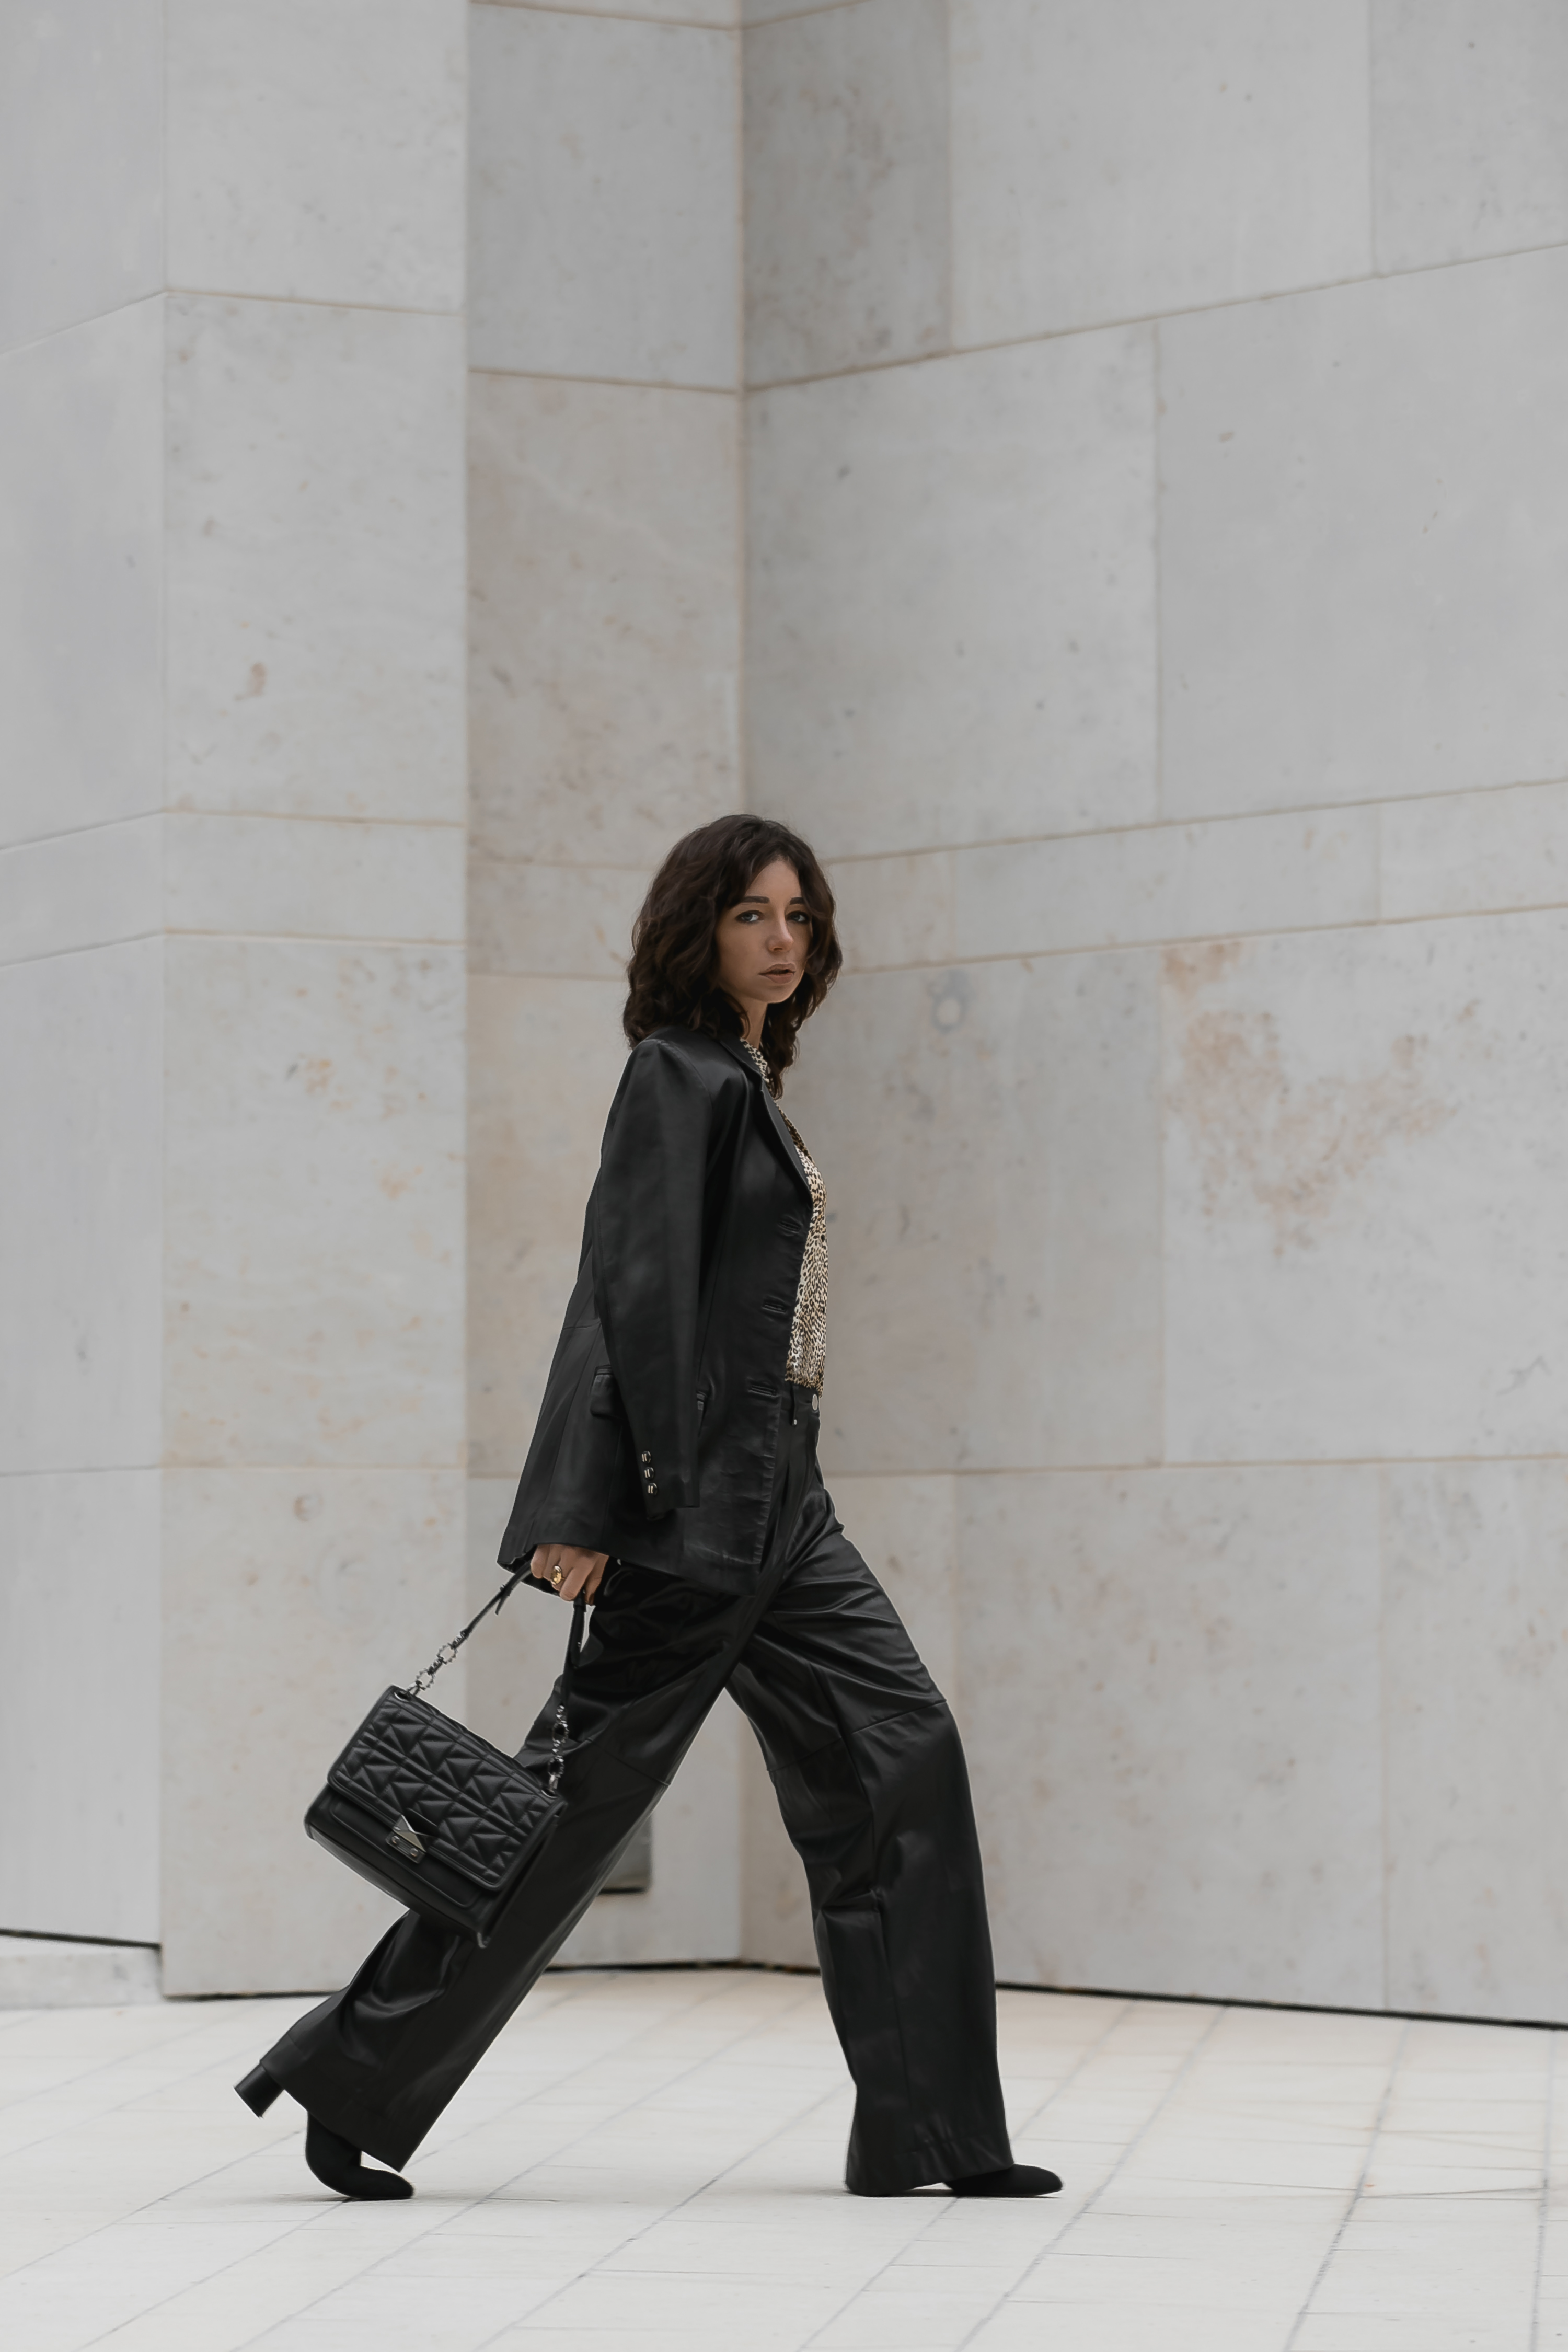 modeblogger-2019-jasmin-kessler-outfit-style-trends-winter